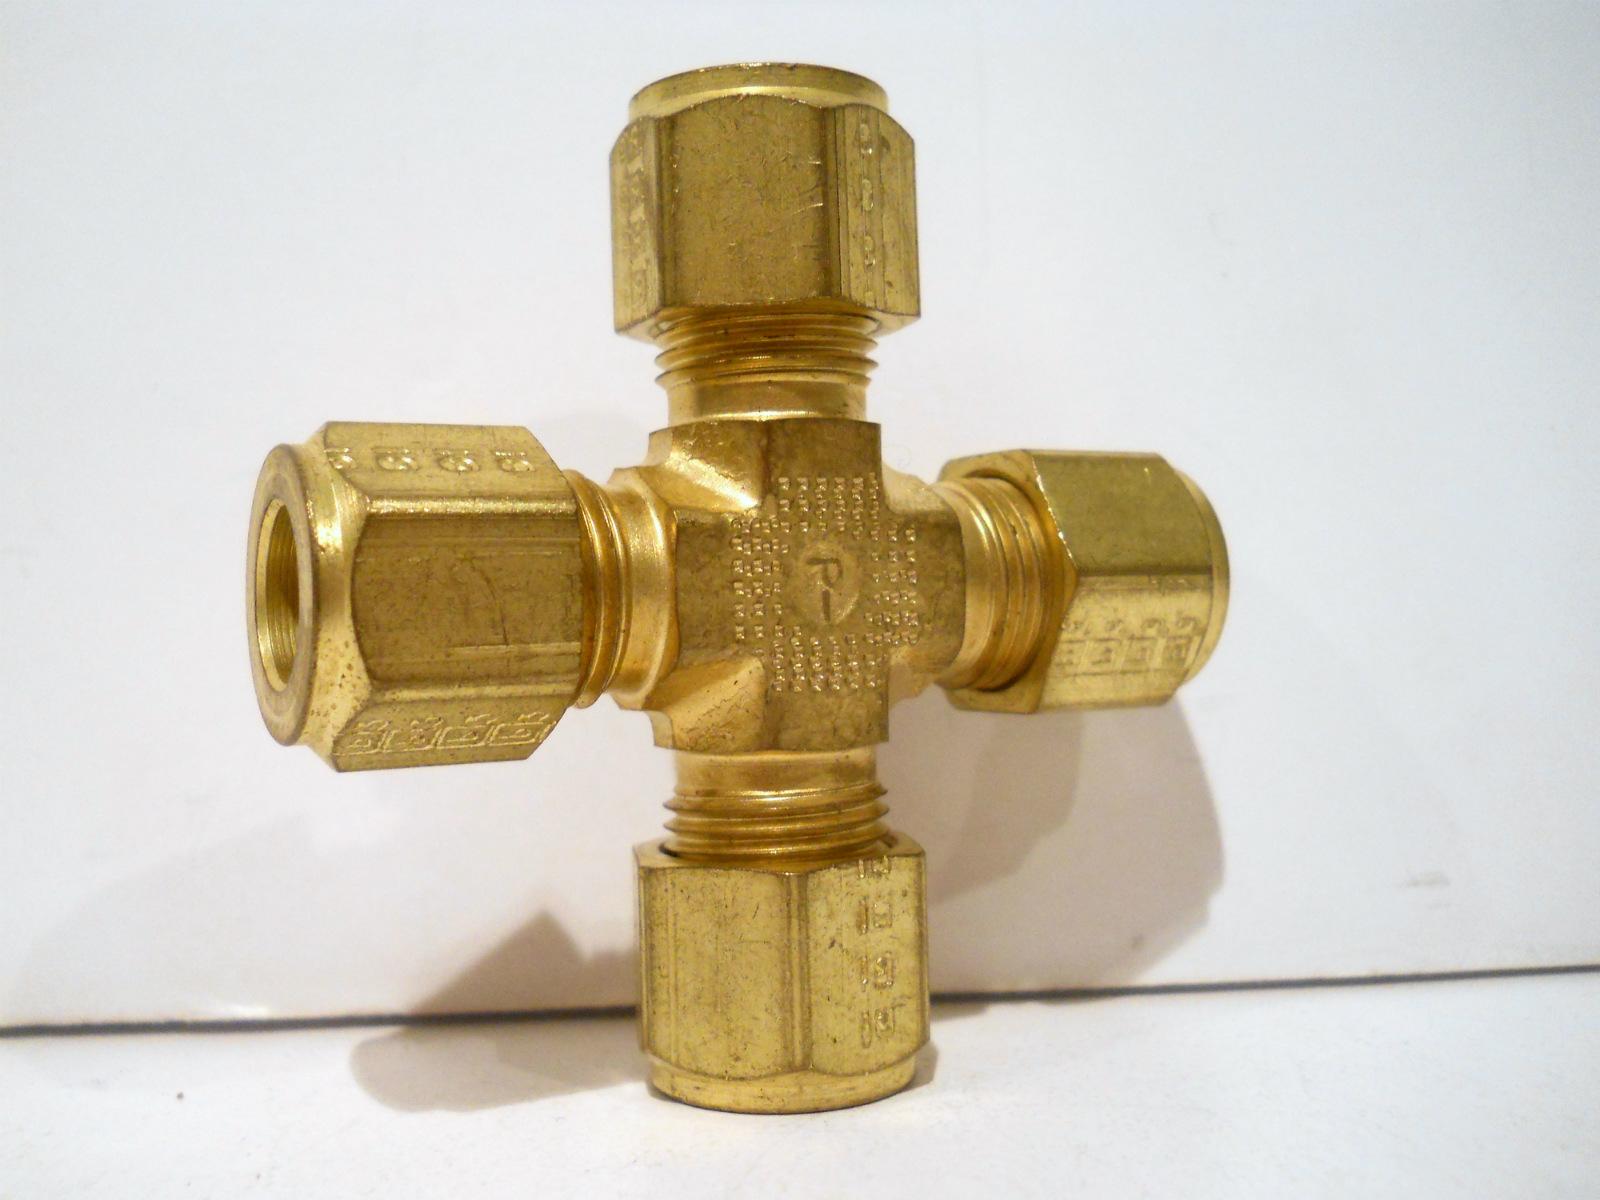 New parker brass quot tube cpi compression cross union